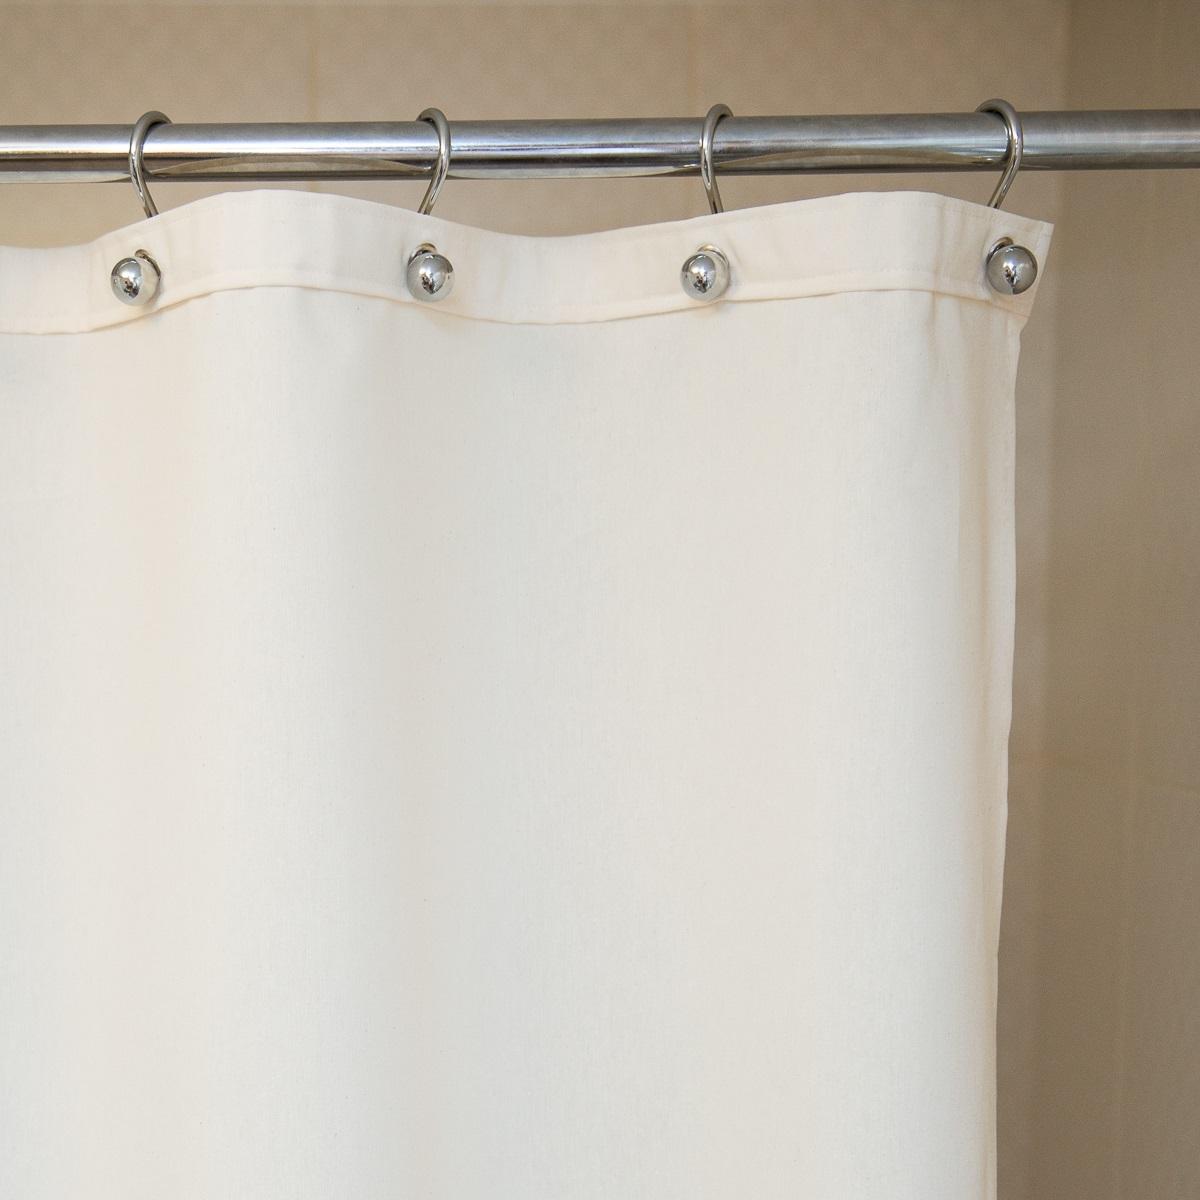 Защитная шторка для ванной 240х200 Liso Beige от Arti-Deco